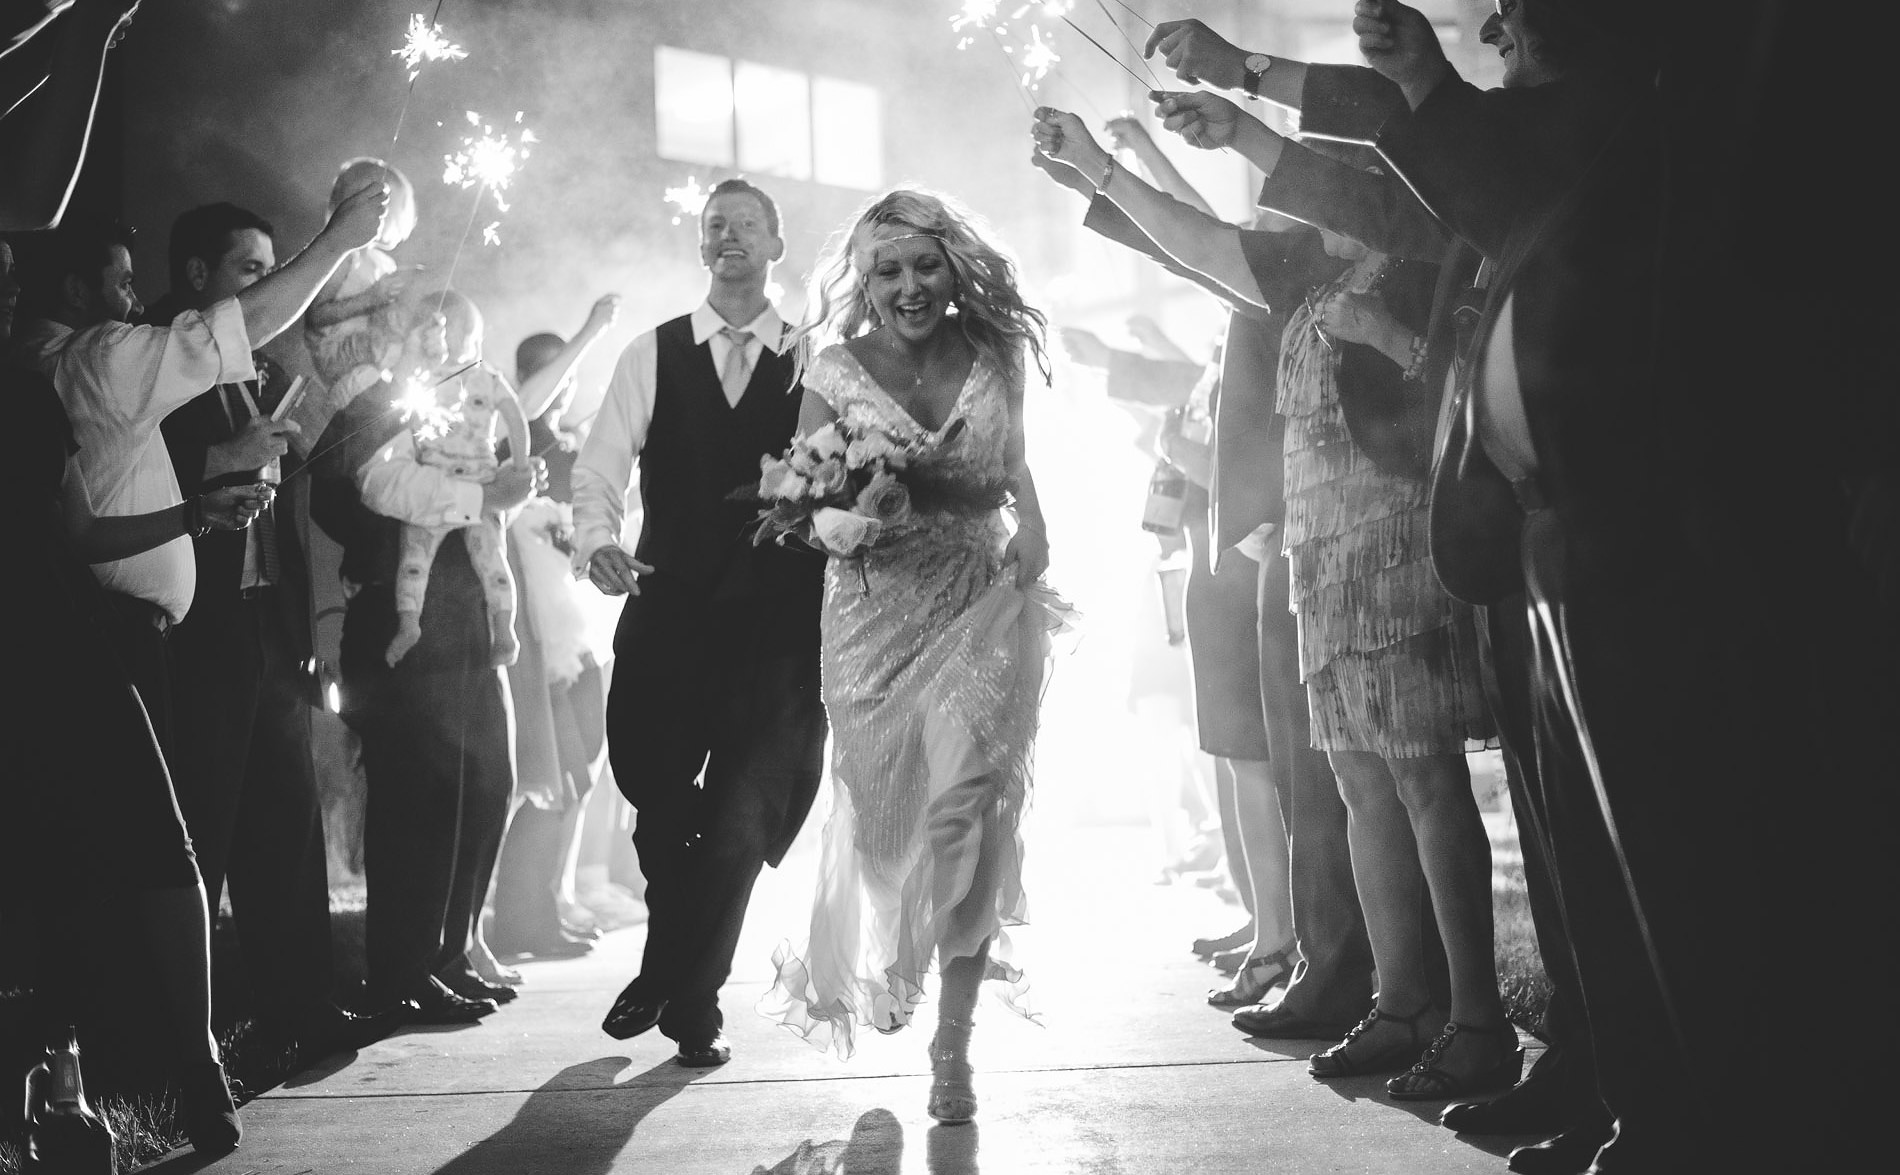 canaanvalleyinstitute wedding reception sparklers